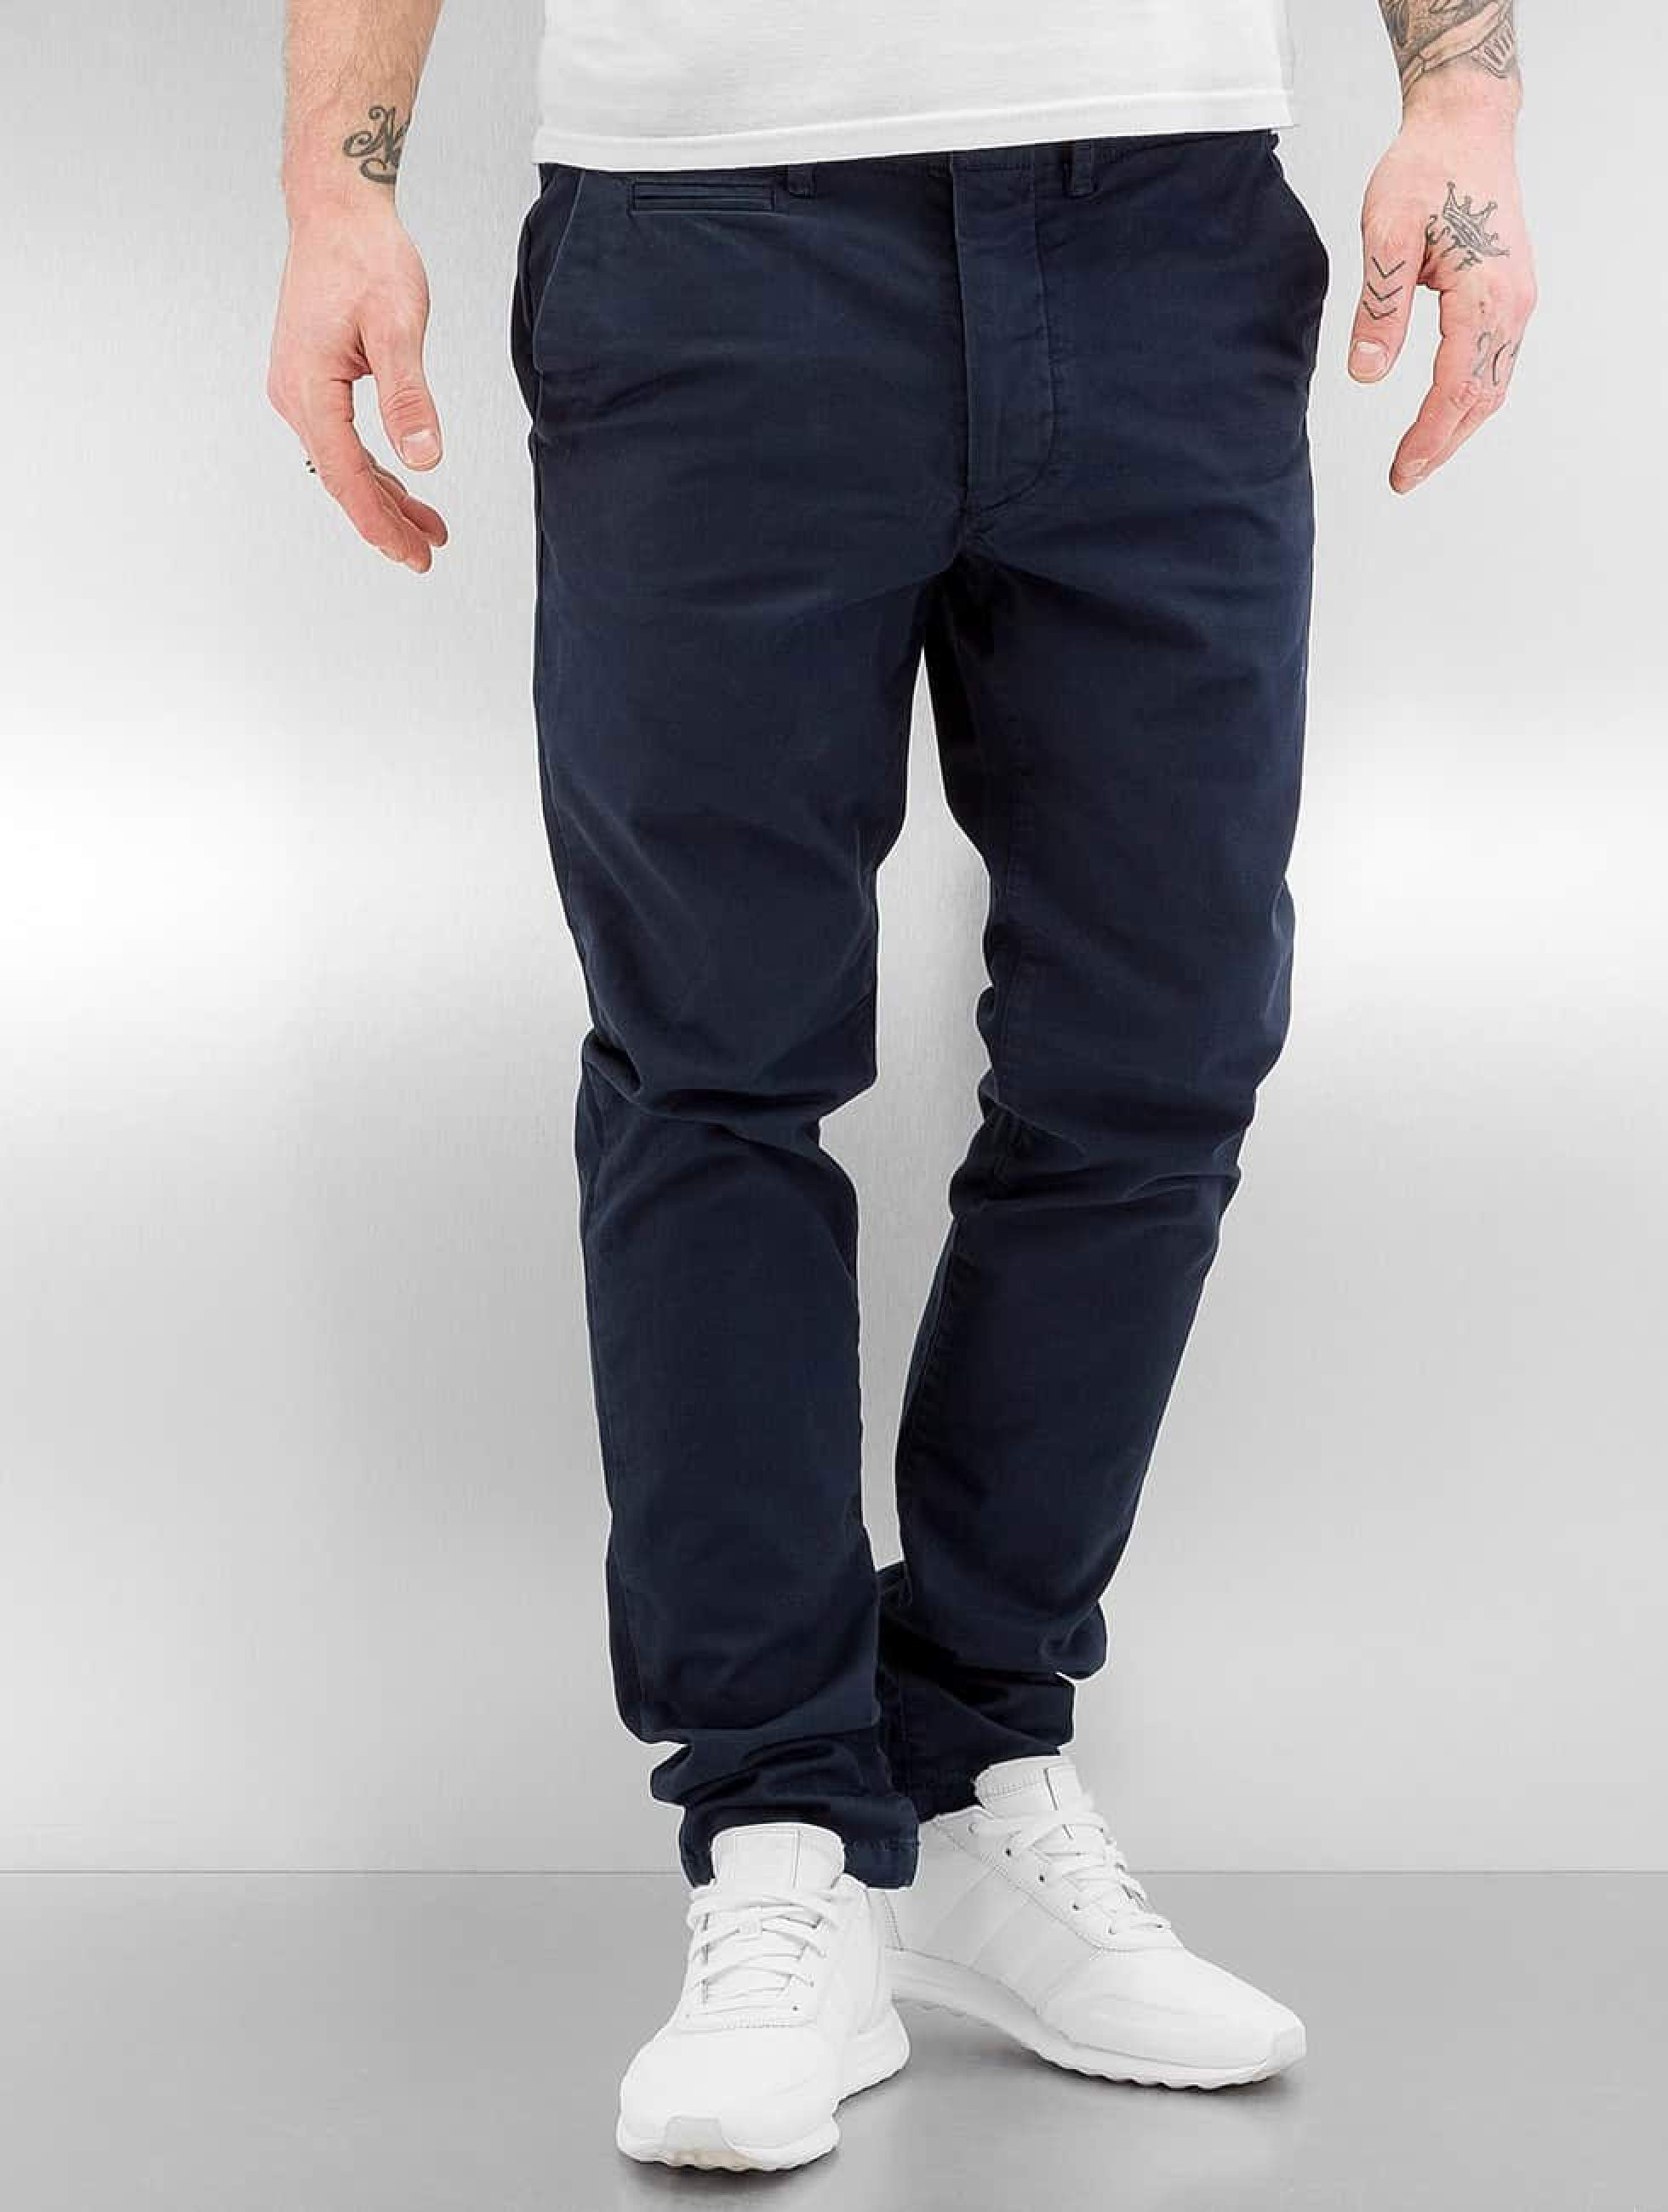 Jjimarco Chino Pantalon Homme Bleu 307157 Jones amp; Jjenzo Jack 7wqpCp